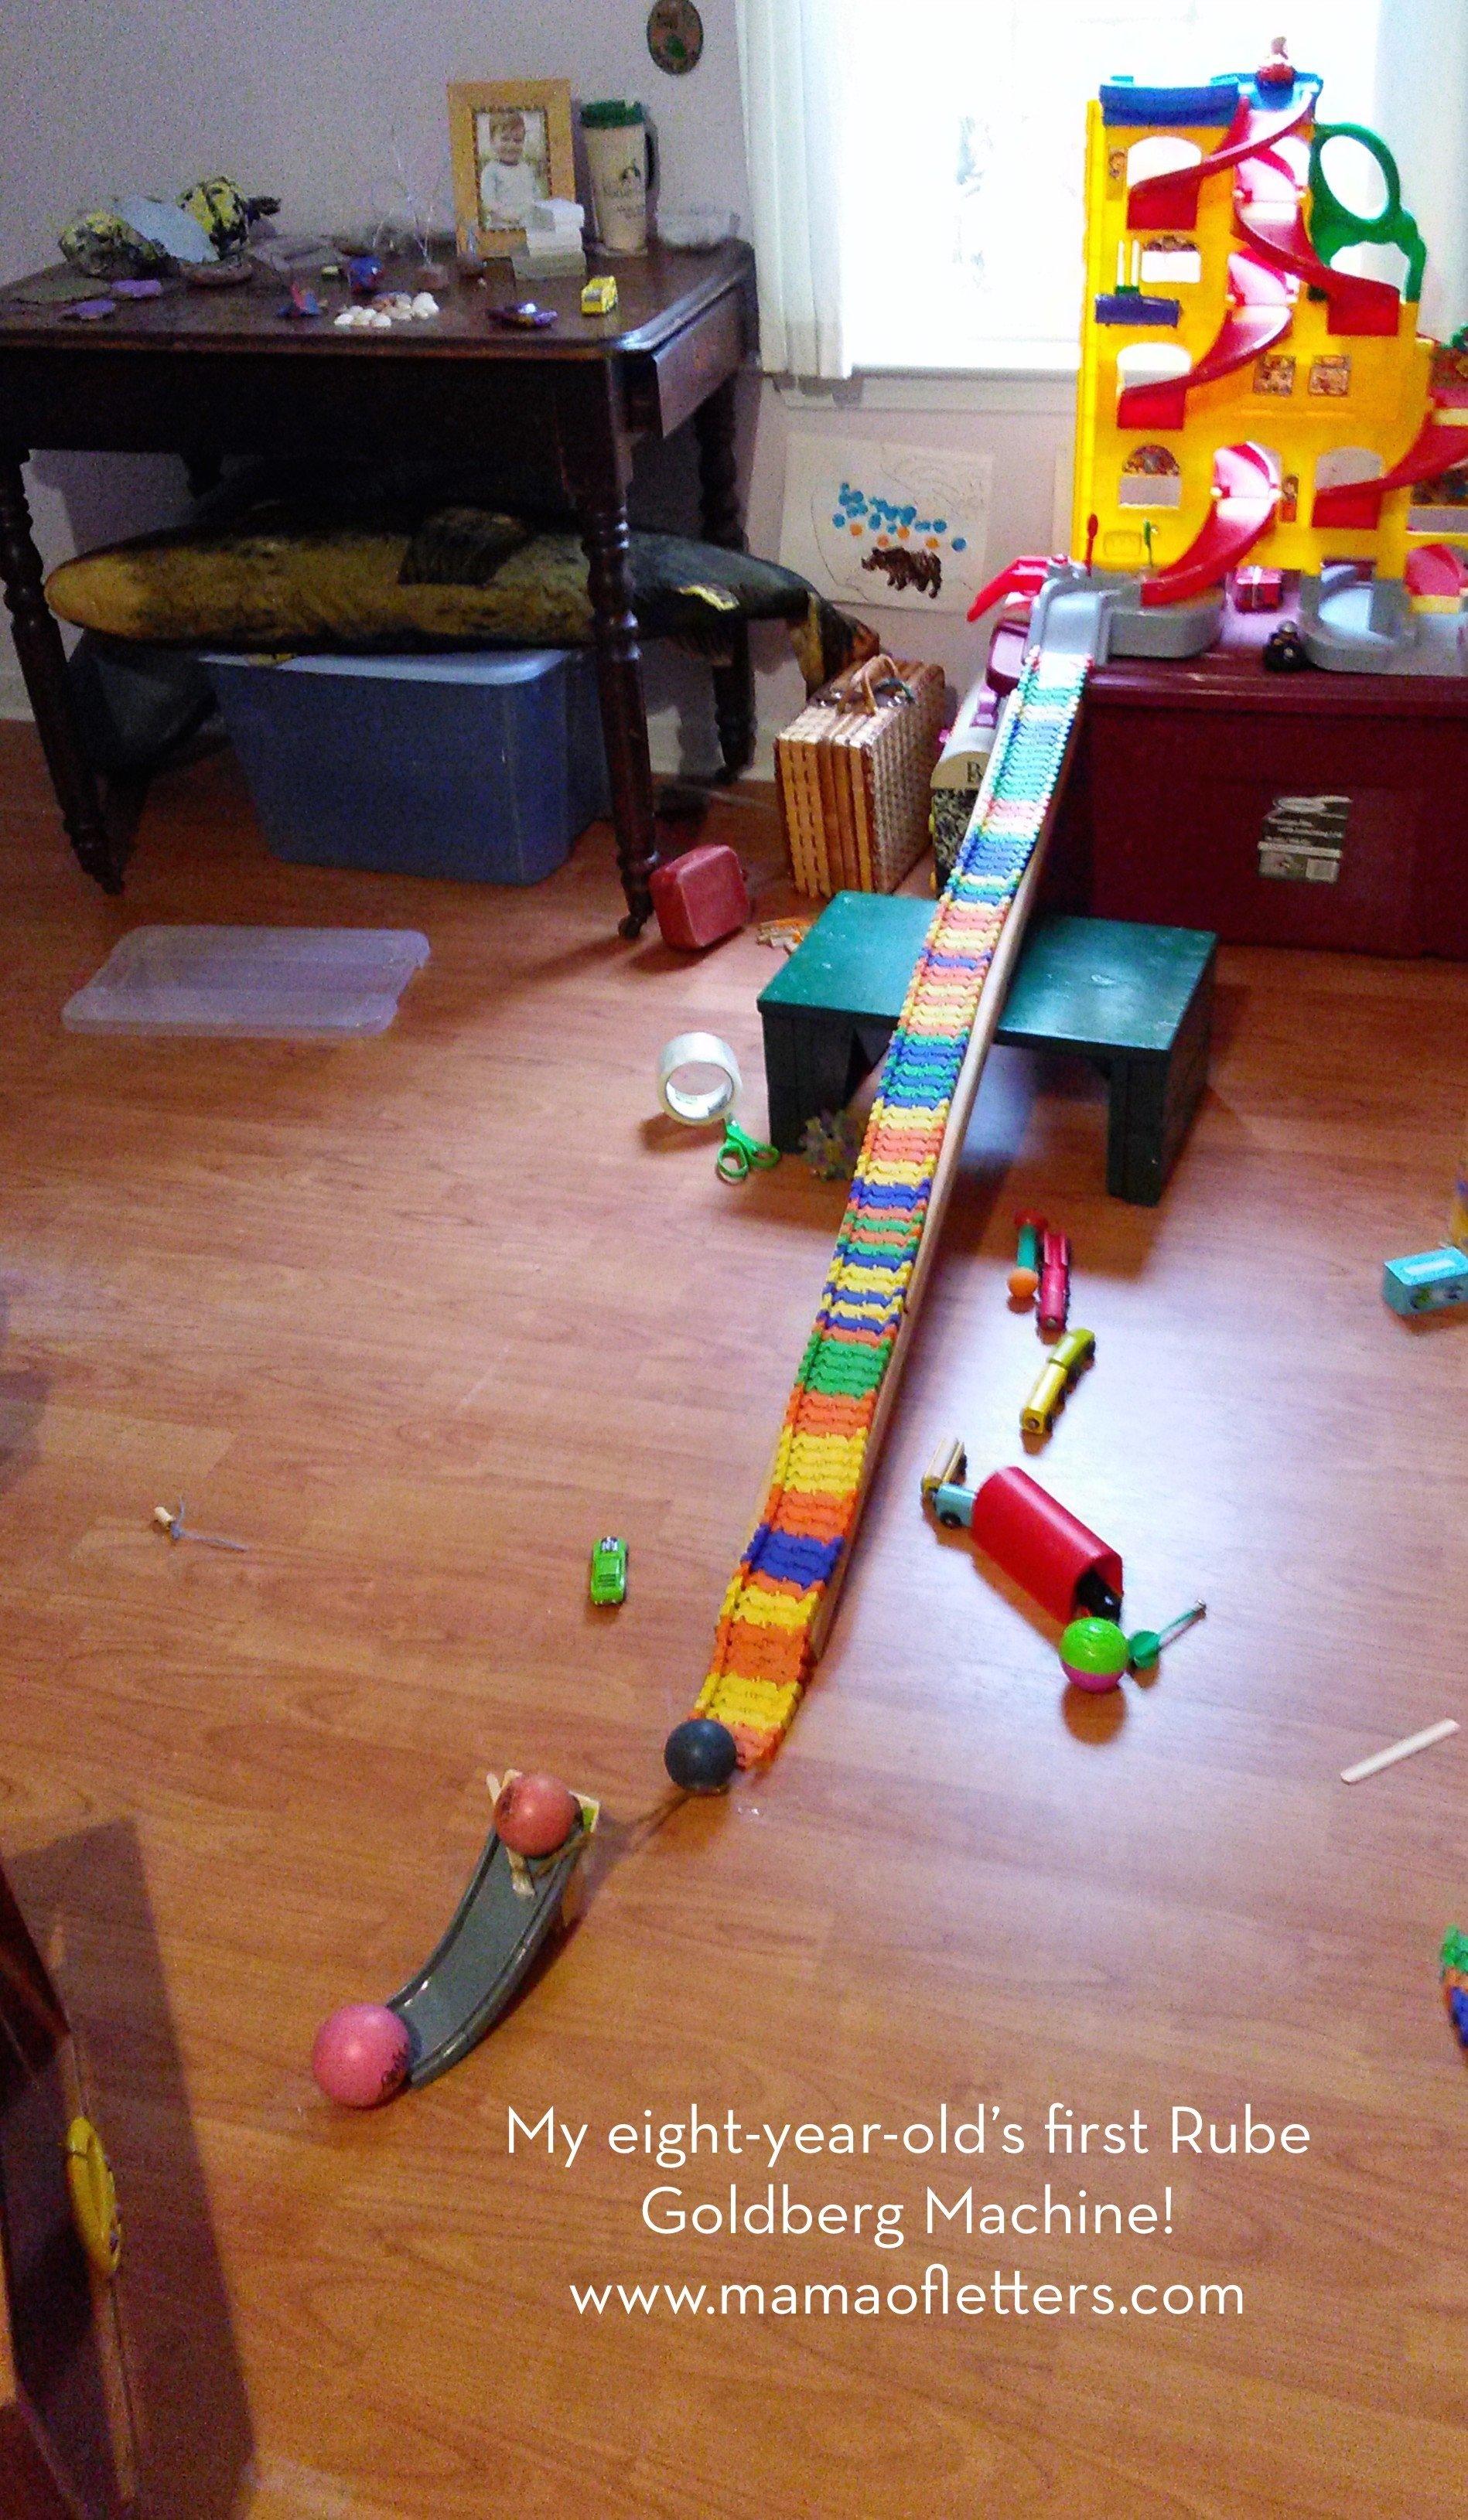 10 Fabulous Rube Goldberg Machine Ideas 10 Steps project based homeschooling rube goldberg machine mama of letters 3 2020